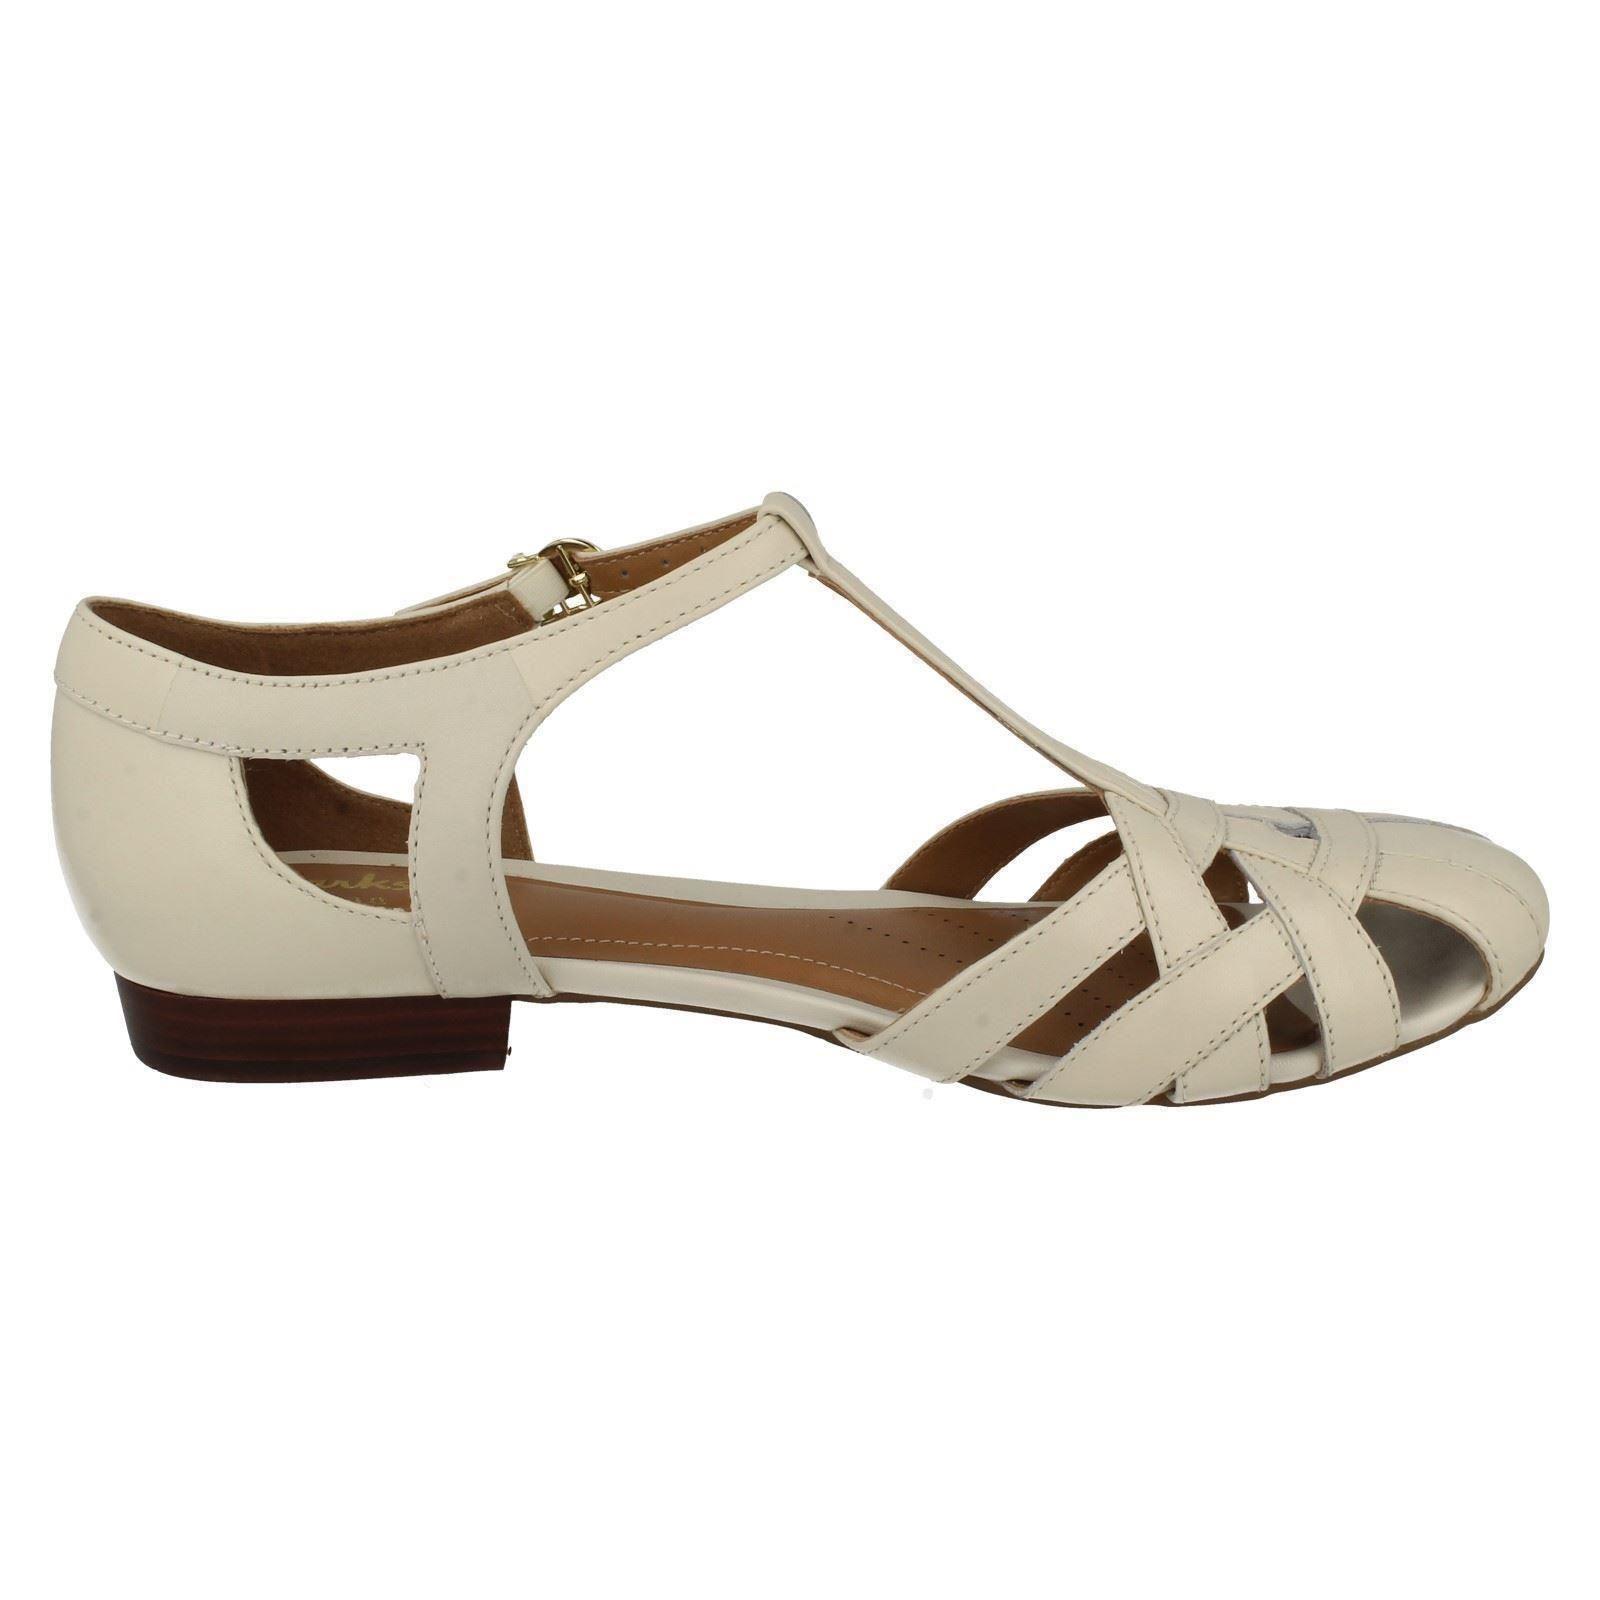 85fb5a727fe1d Ladies-Clarks-Summer-Shoes-Henderson-Luck thumbnail 15